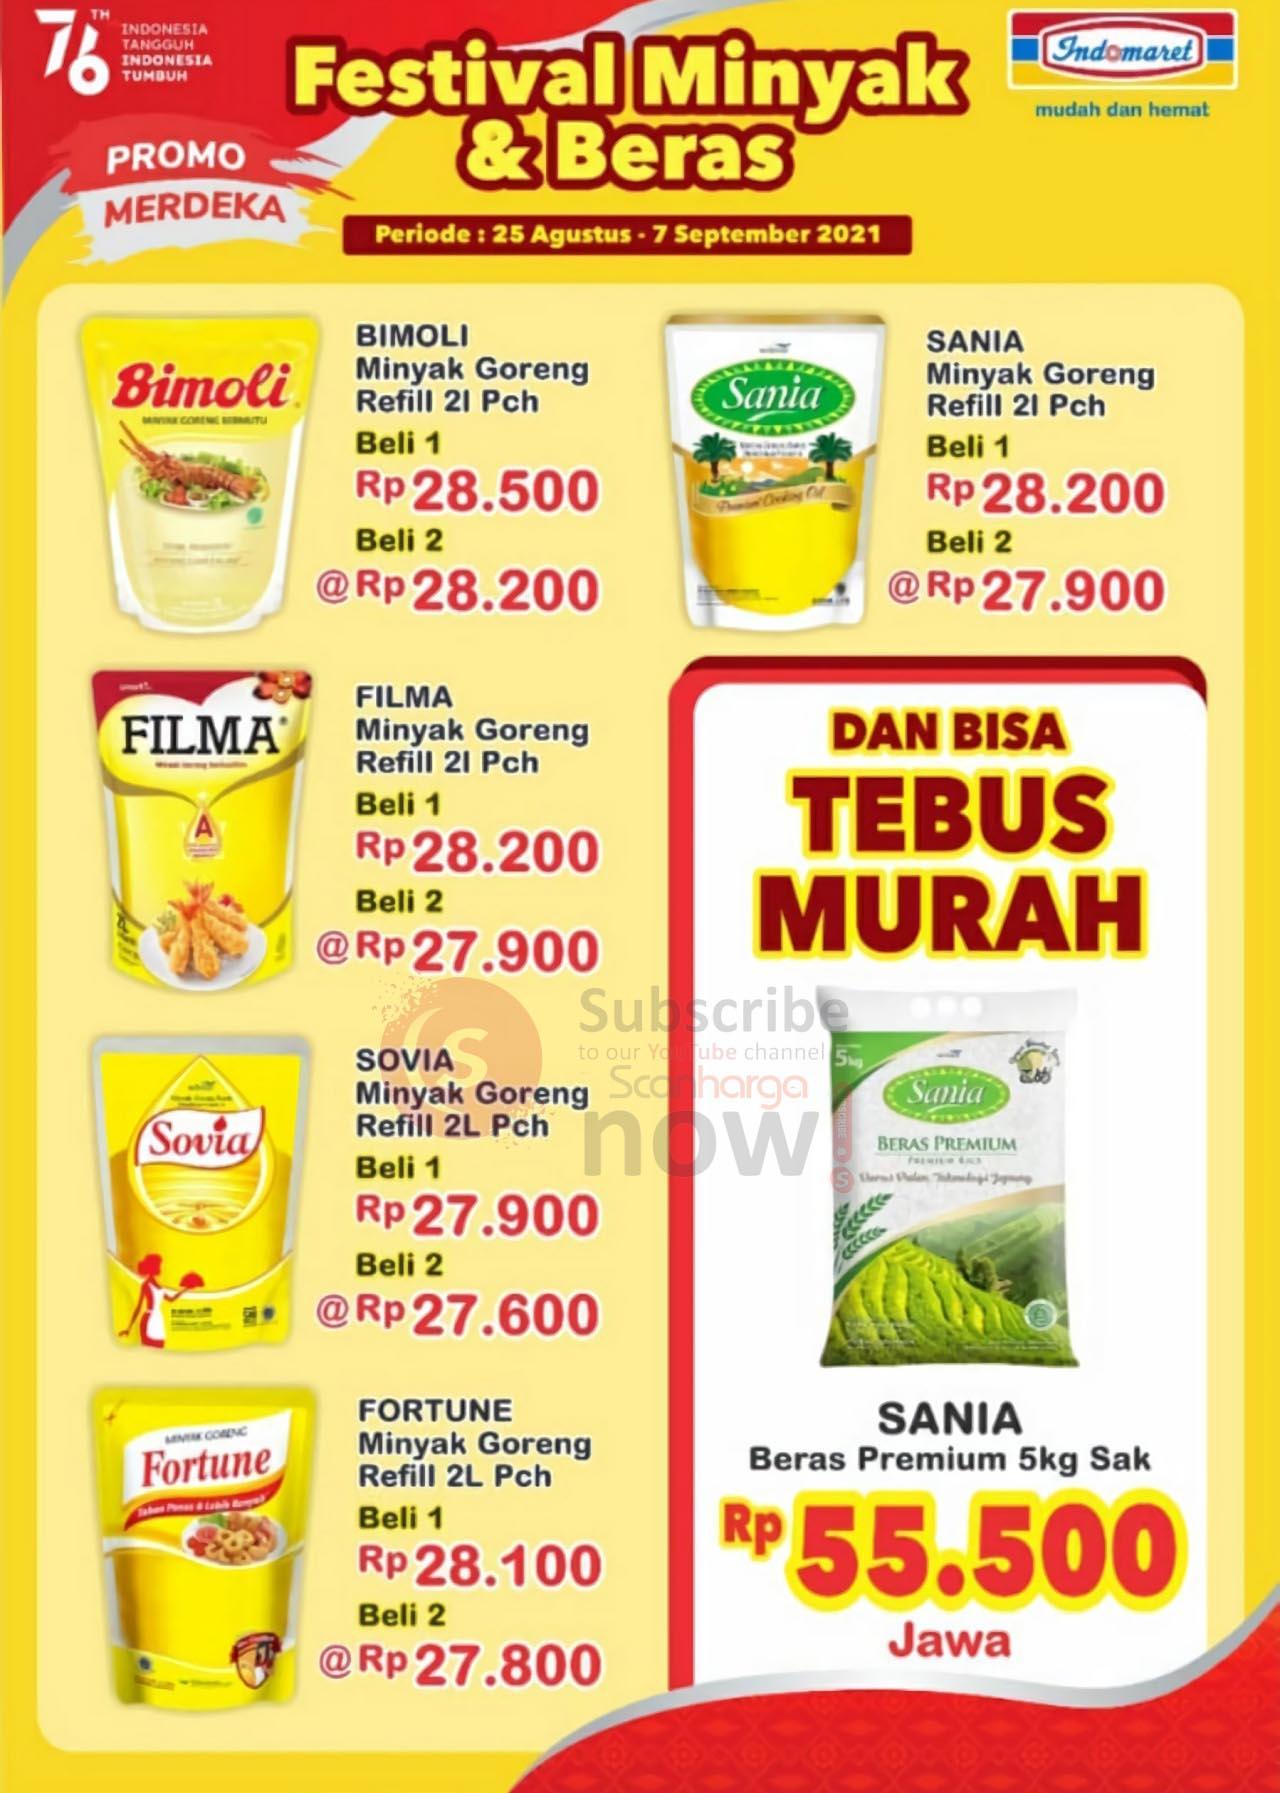 Promo Indomaret Festival Minyak Goreng & Beras Periode 25 Agustus - 7 September 2021